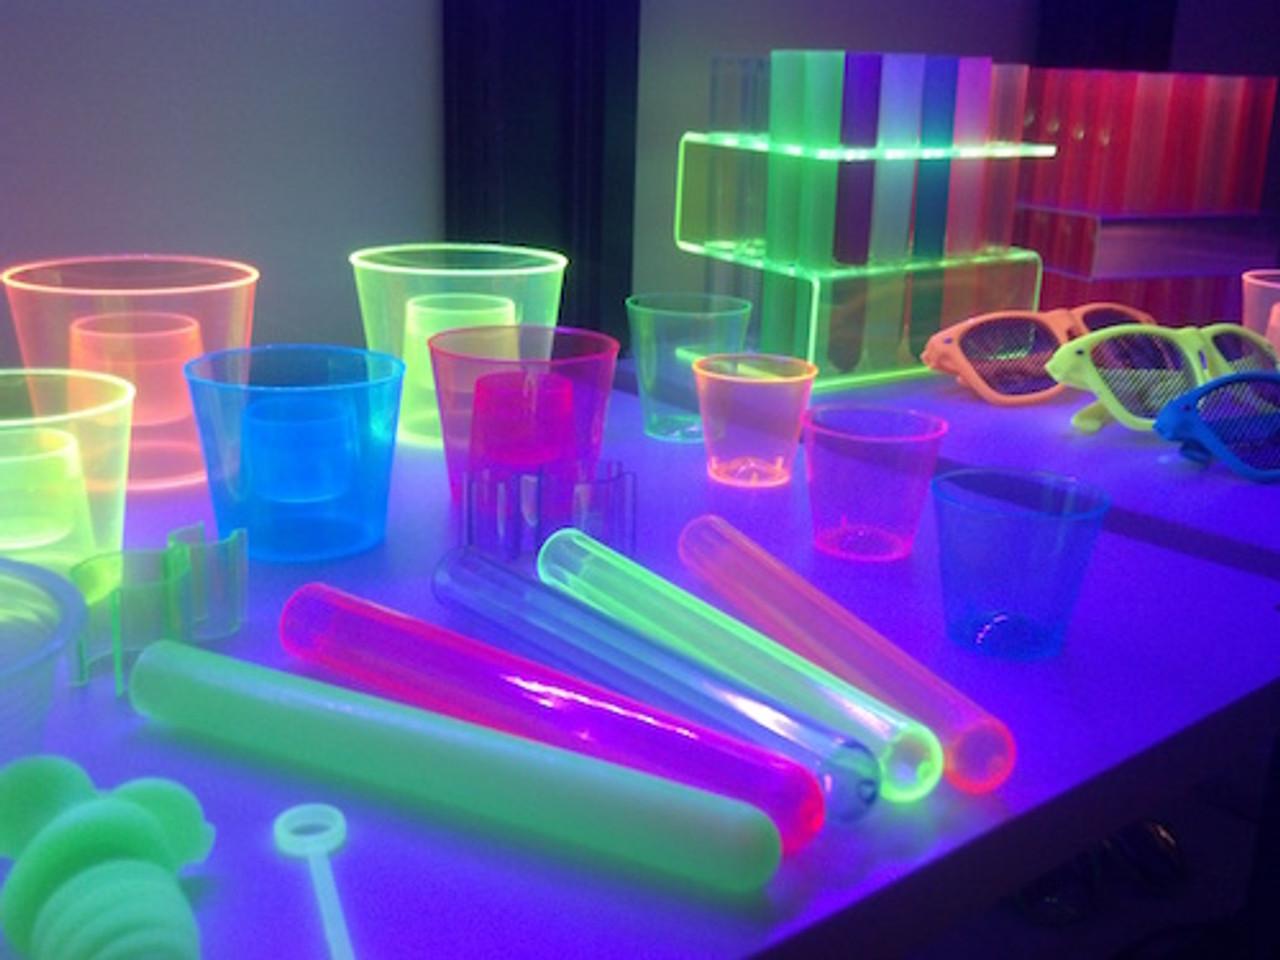 NEON SHOT GLASSES 2 OZ, PARTIES, NEON, GLOW, UV REACTIVE, SHOT GLASS, 1 OZ, 2 OZ, Ounce, Shotcup, plastic, shot, glasses, cups, alcohol, liquor, bar, club, party,NEON, SHOT, GLASSES, 2 OZ, PARTIES, PARTY, NEON, GLOW, UV REACTIVE, SHOT GLASS, 2 OZ